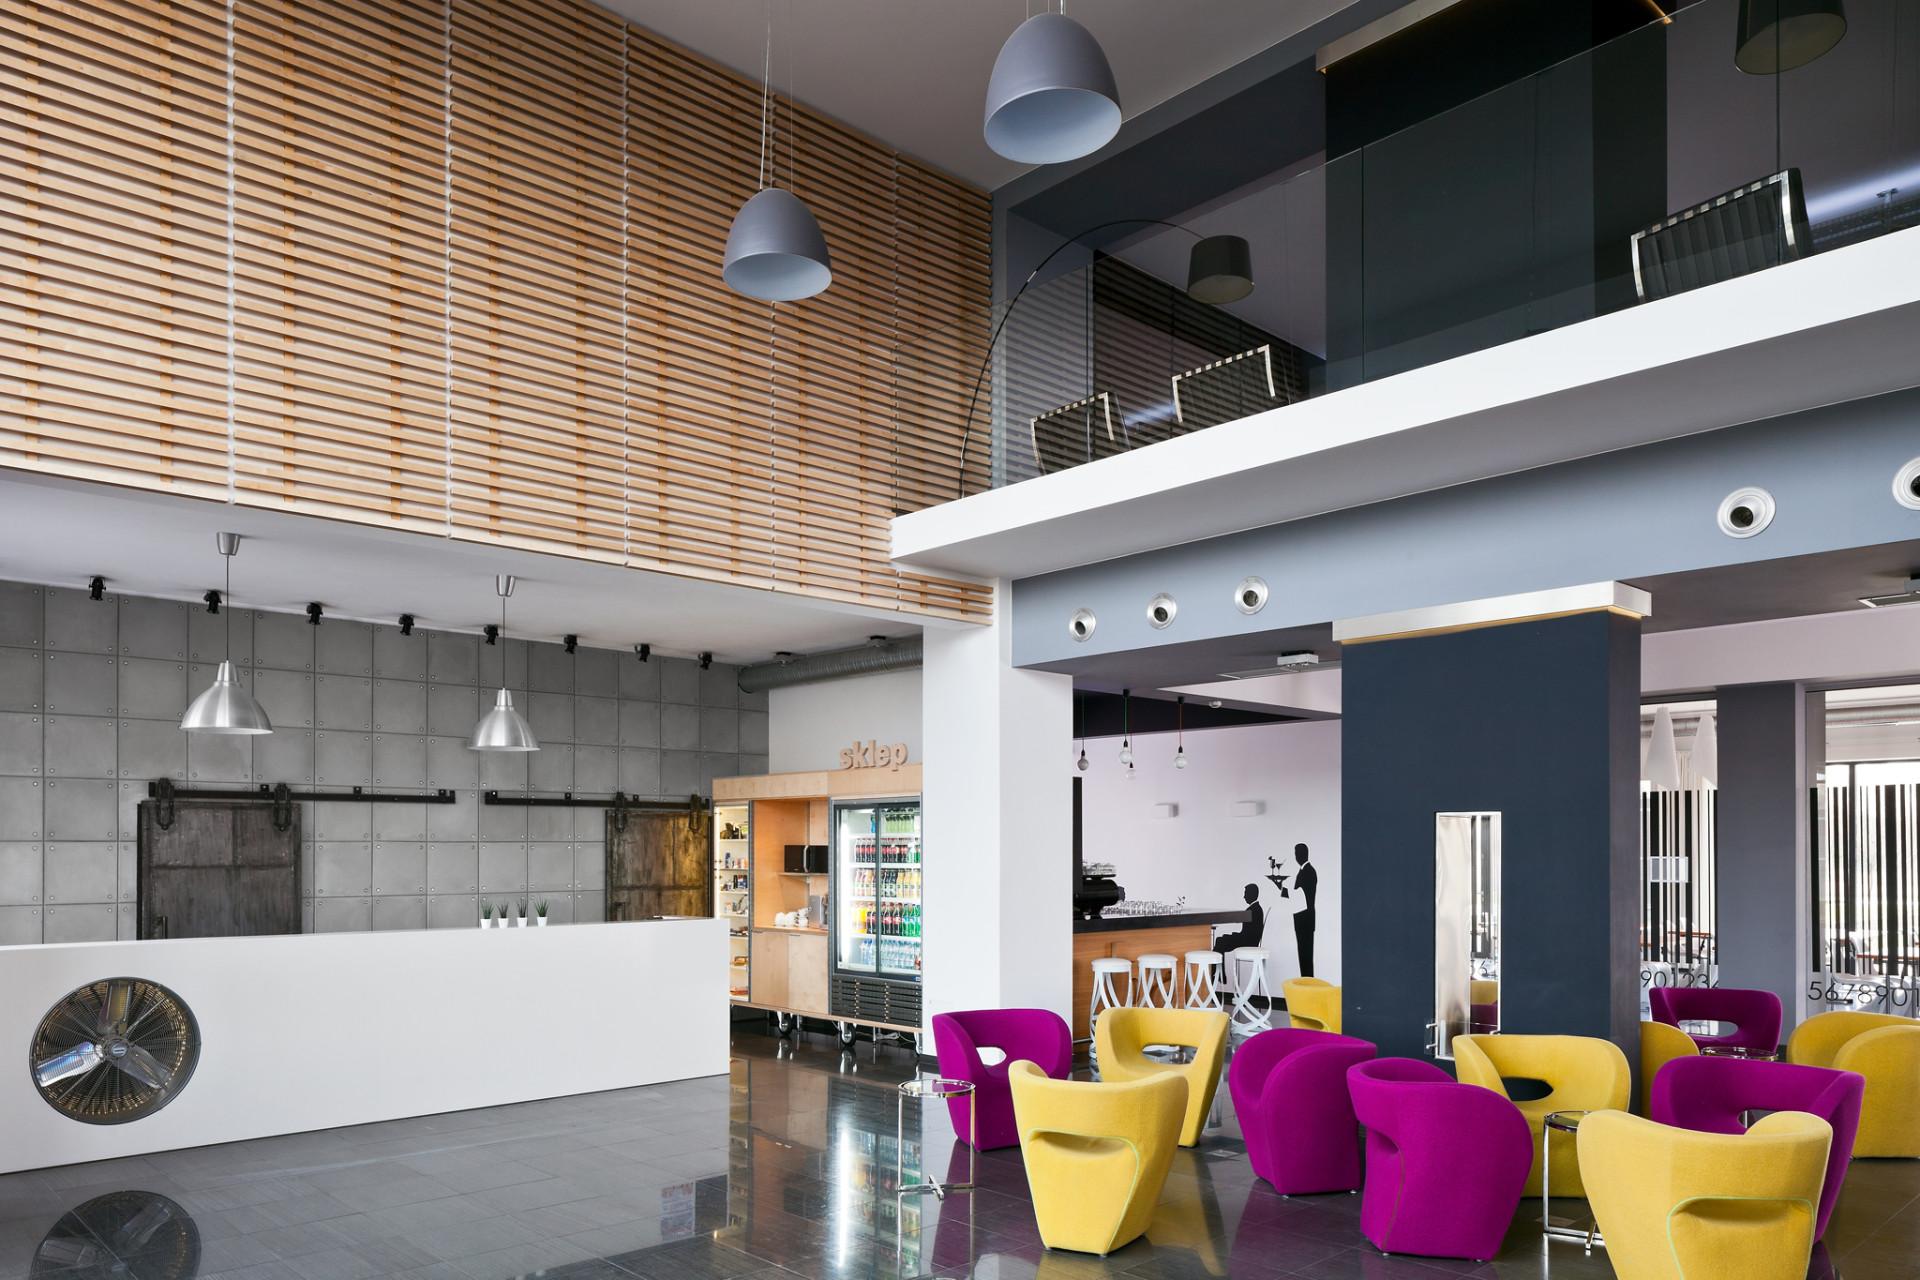 3* Artis Loft Hotel Radziejowice